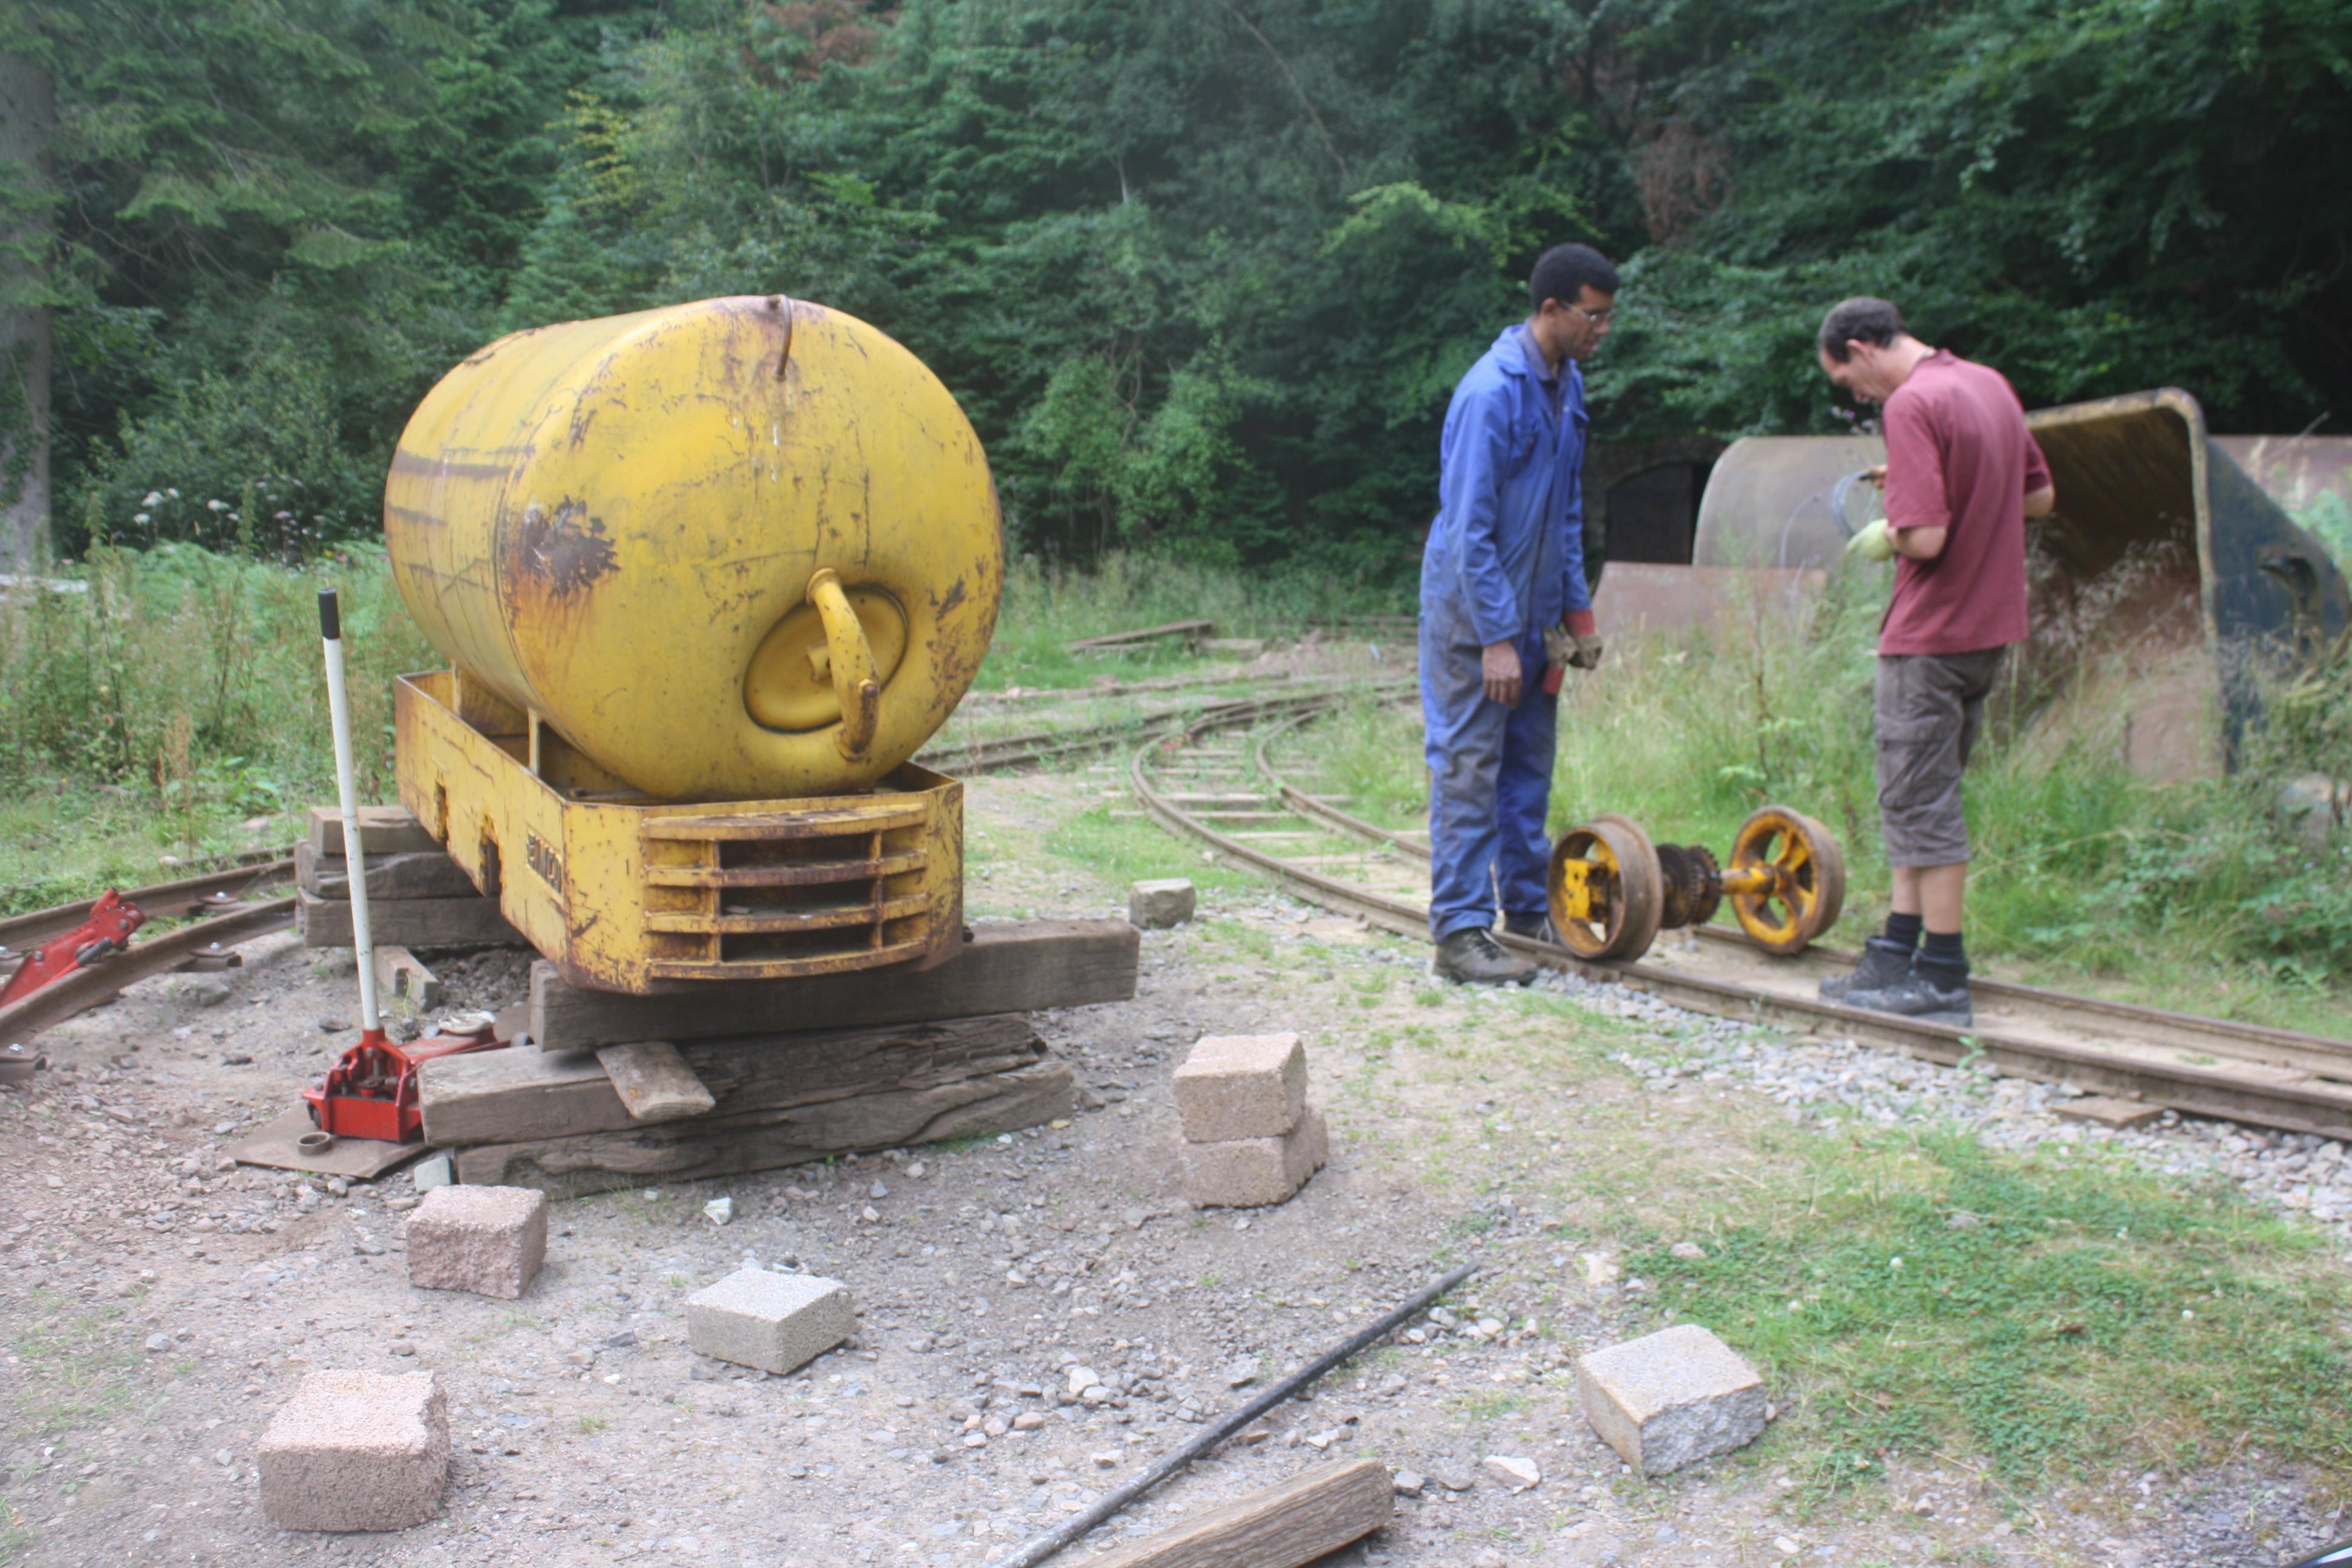 Eimco wheelset on the rails